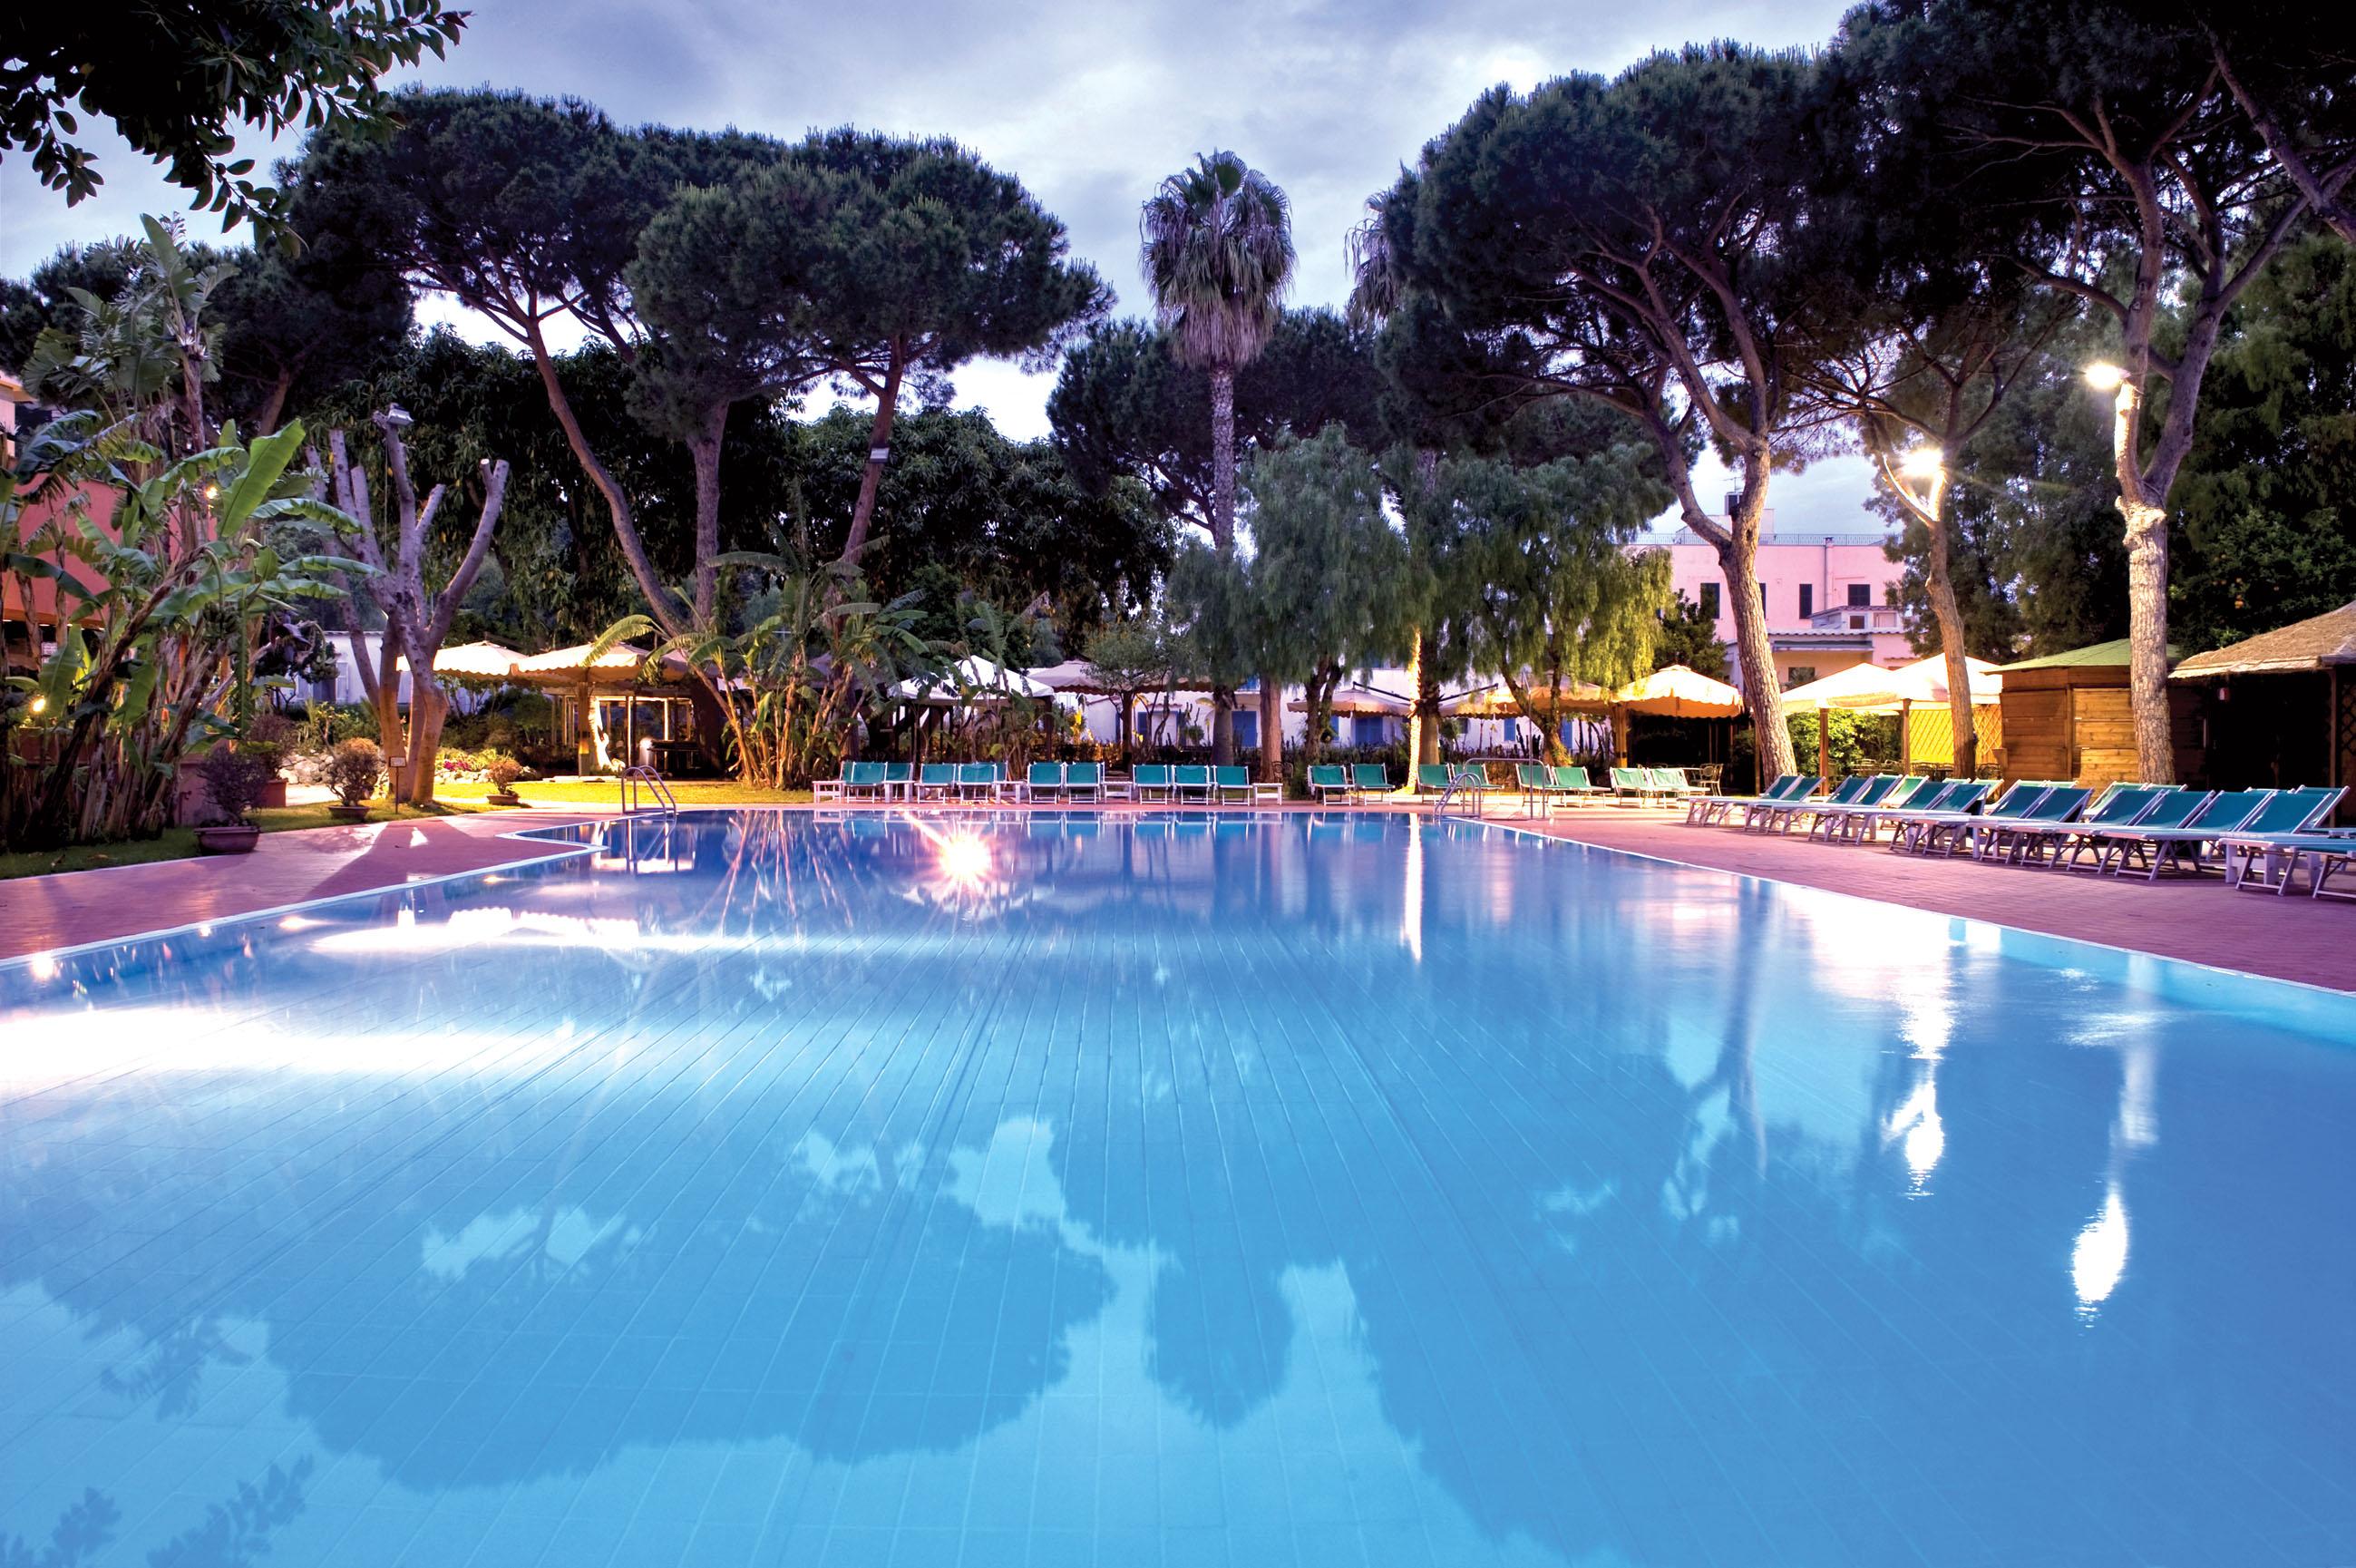 GRAND HOTEL DELLE TERME RE FERDINANDO ISOLA D'ISCHIA (ISCHIA PORTO)